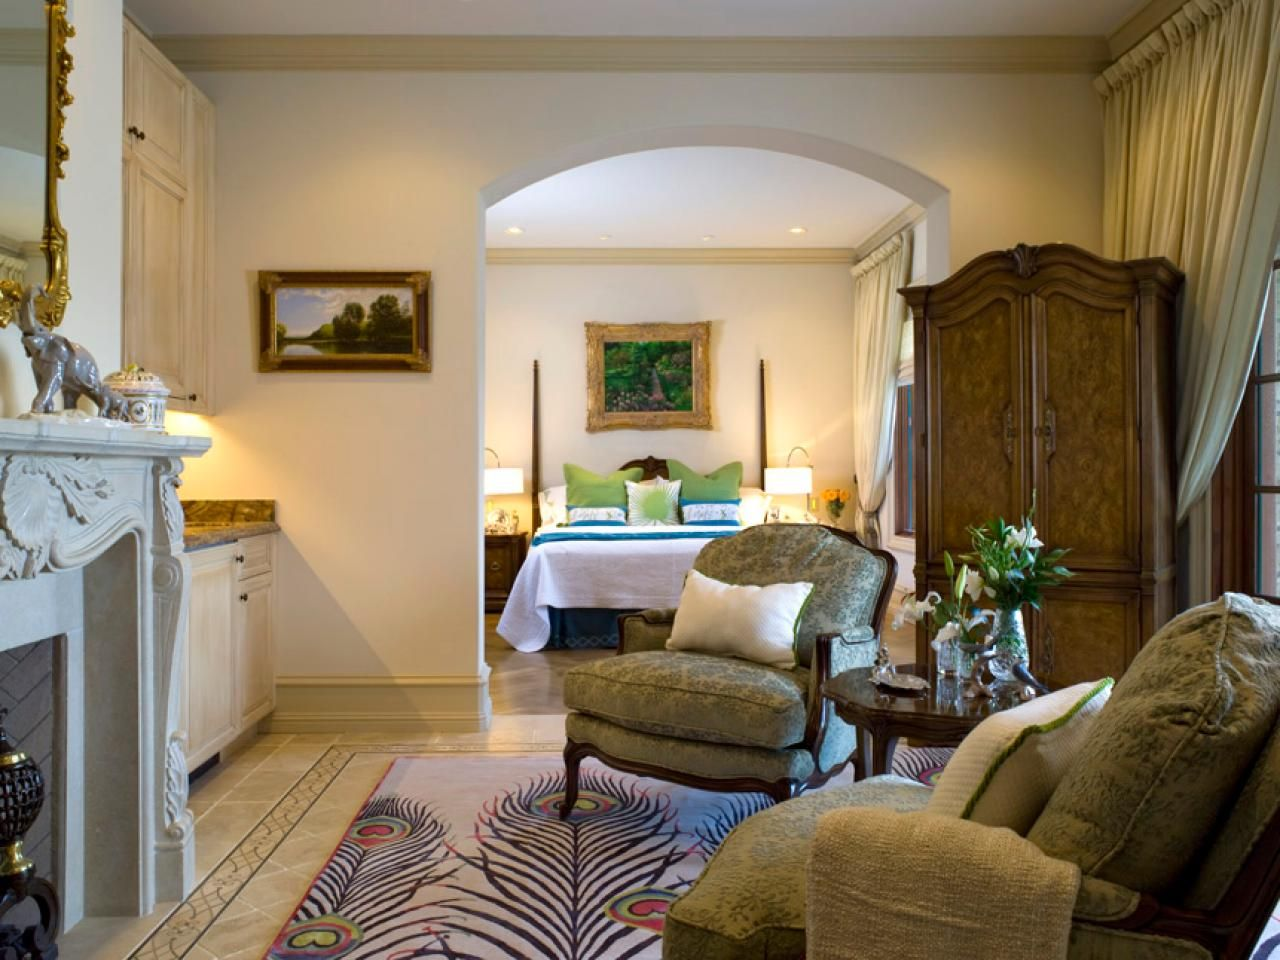 10 Living Room Bedroom Combo Ideas 2020 The Dual Deals In